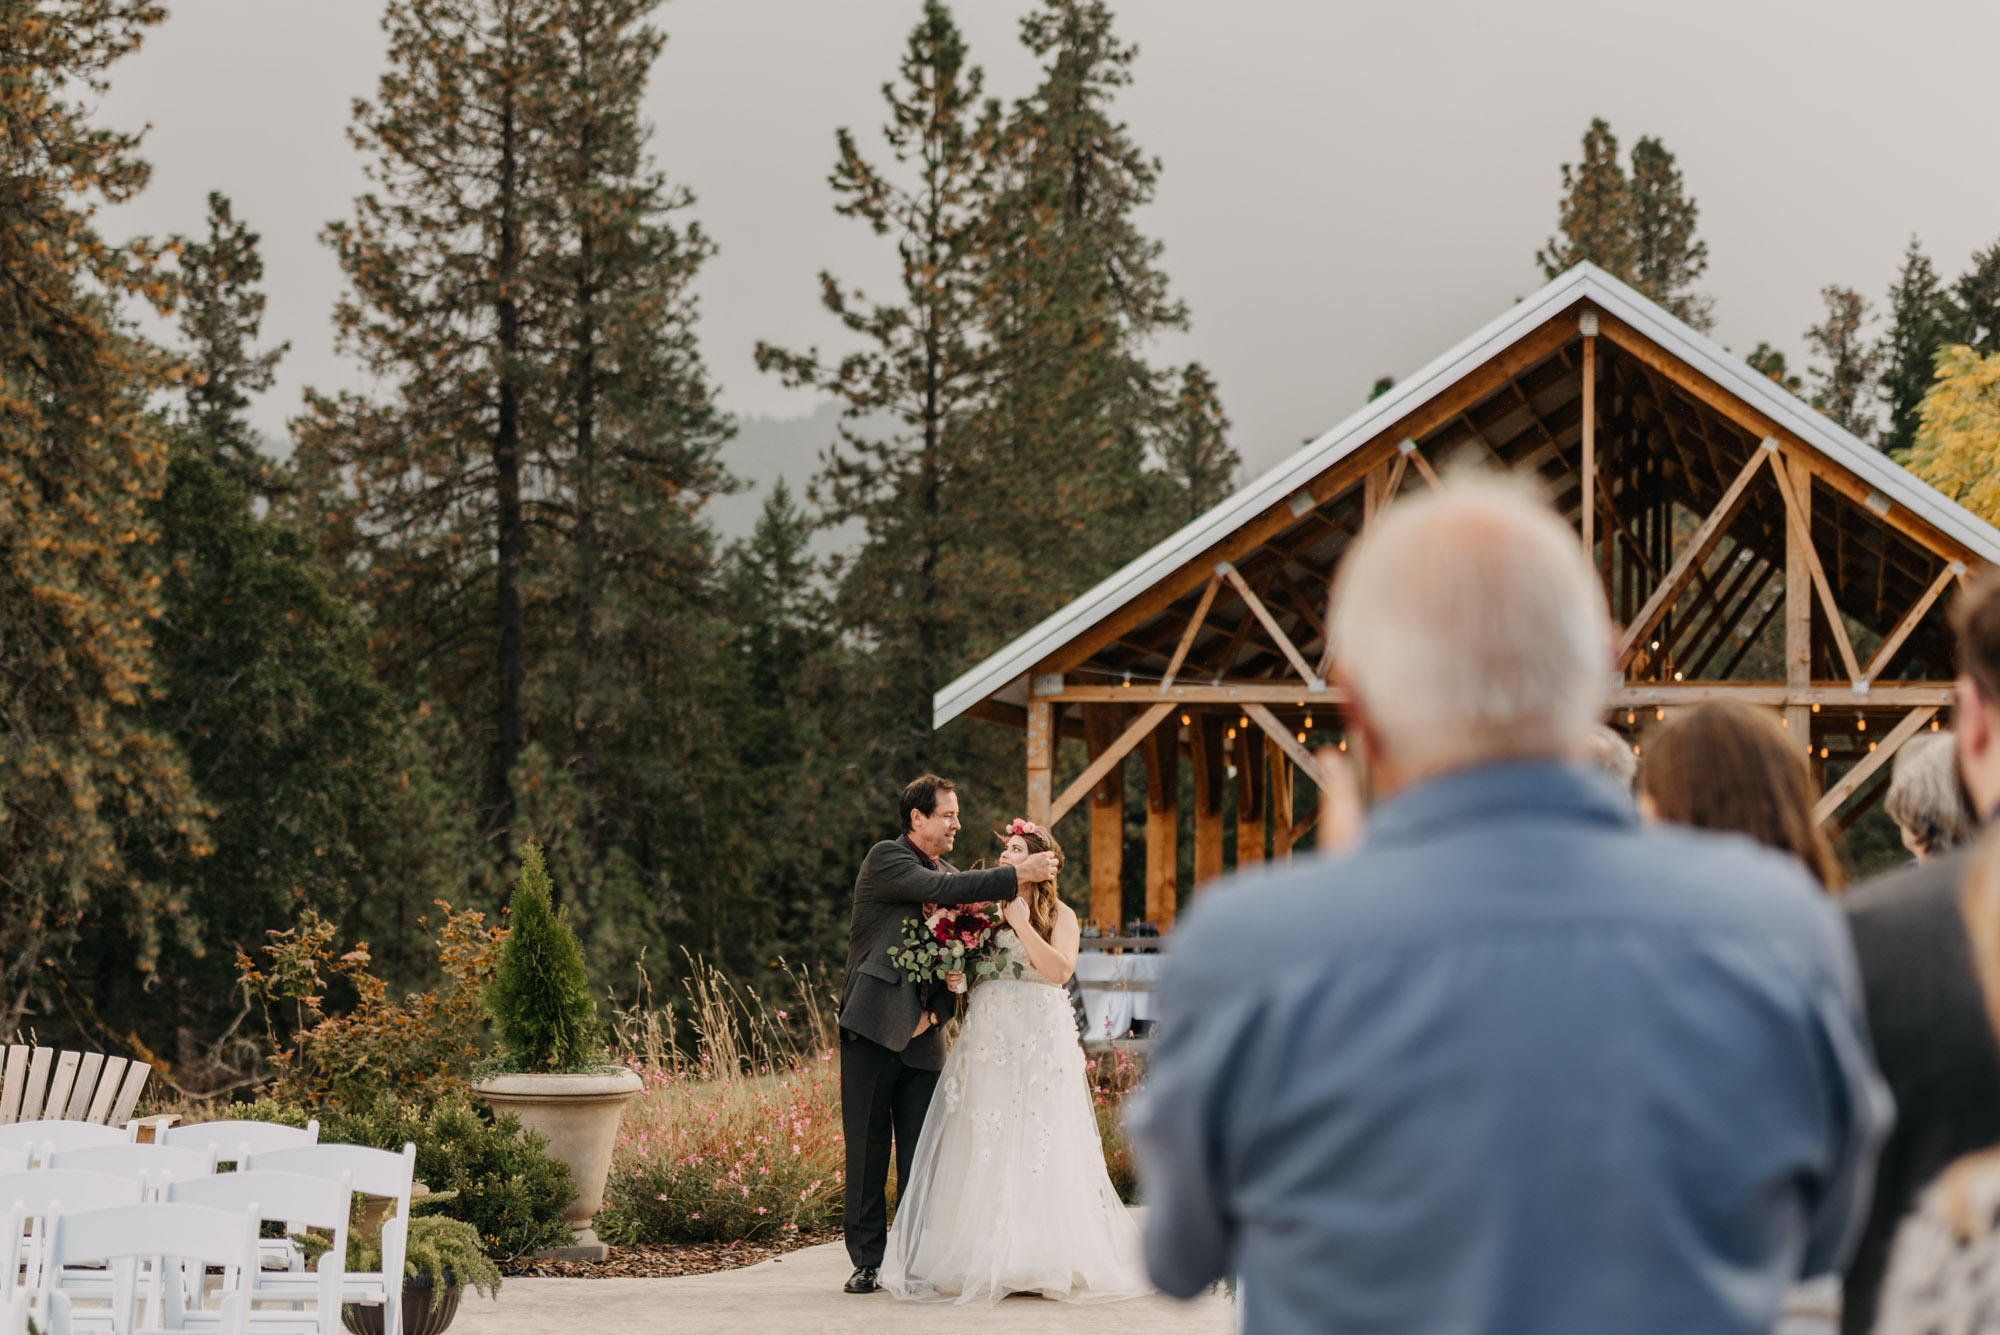 Outdoor-Summer-Ceremony-Washington-Wedding-Rainbow-8914.jpg